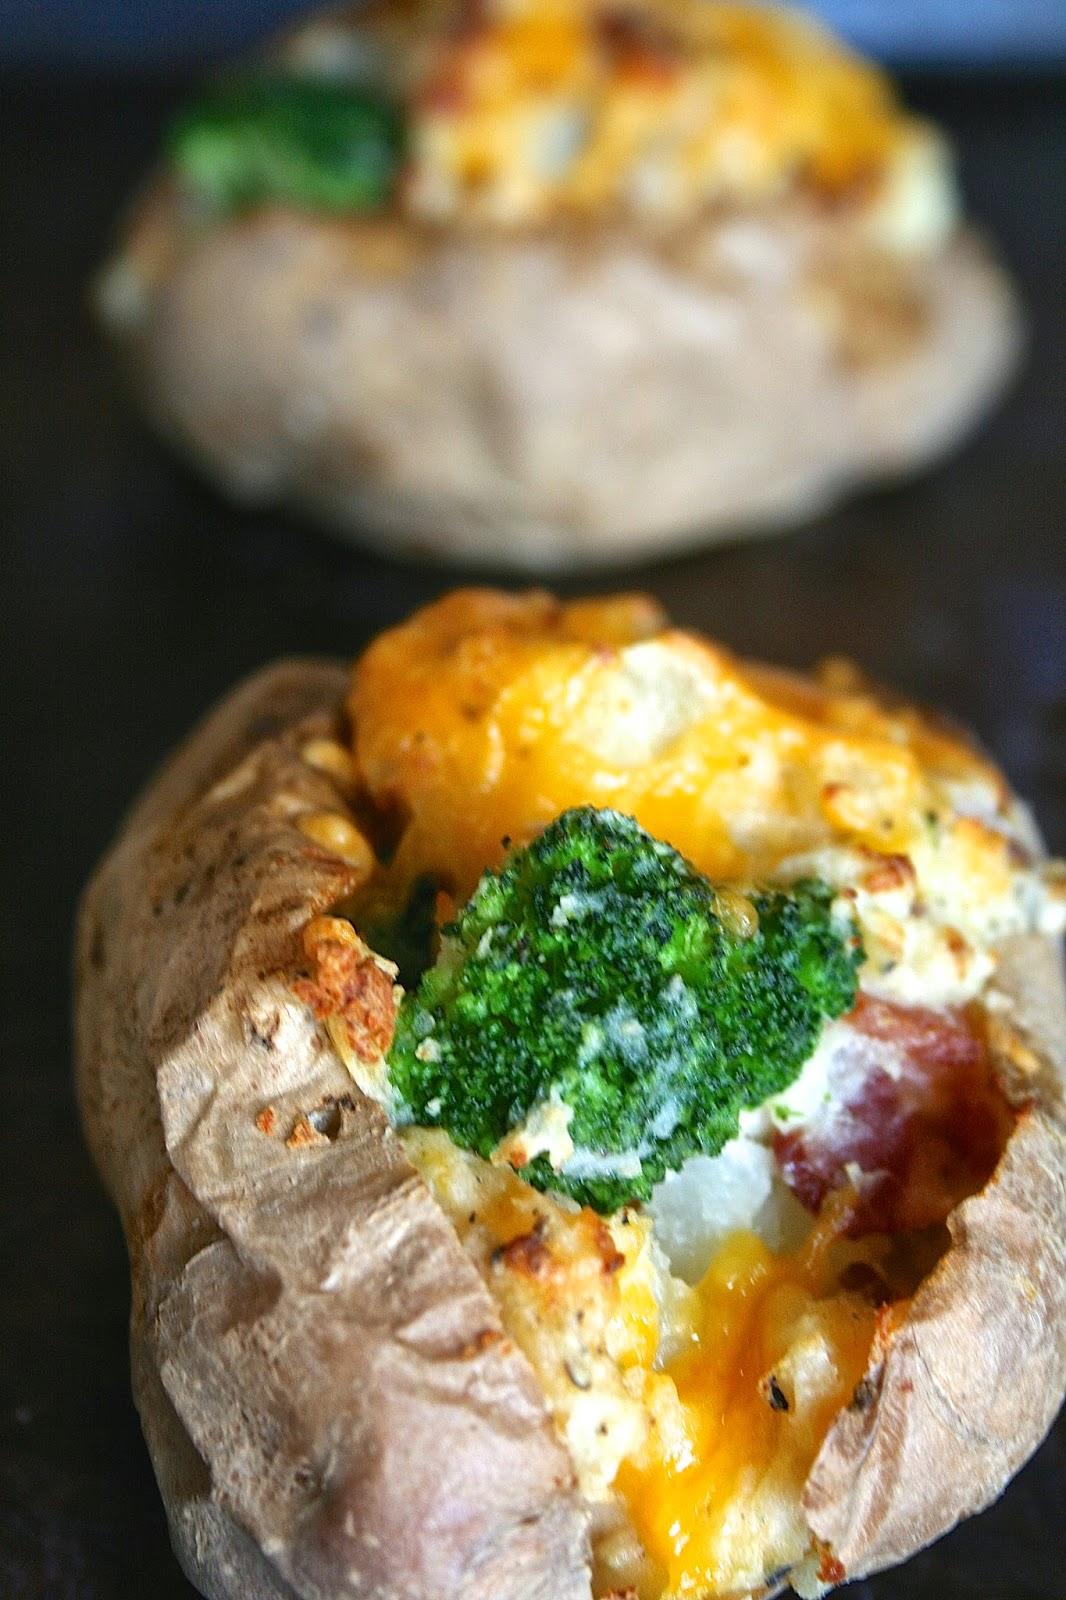 Oregon Transplant: Broccoli, Cheese, & Bacon Twice-Baked Potatoes